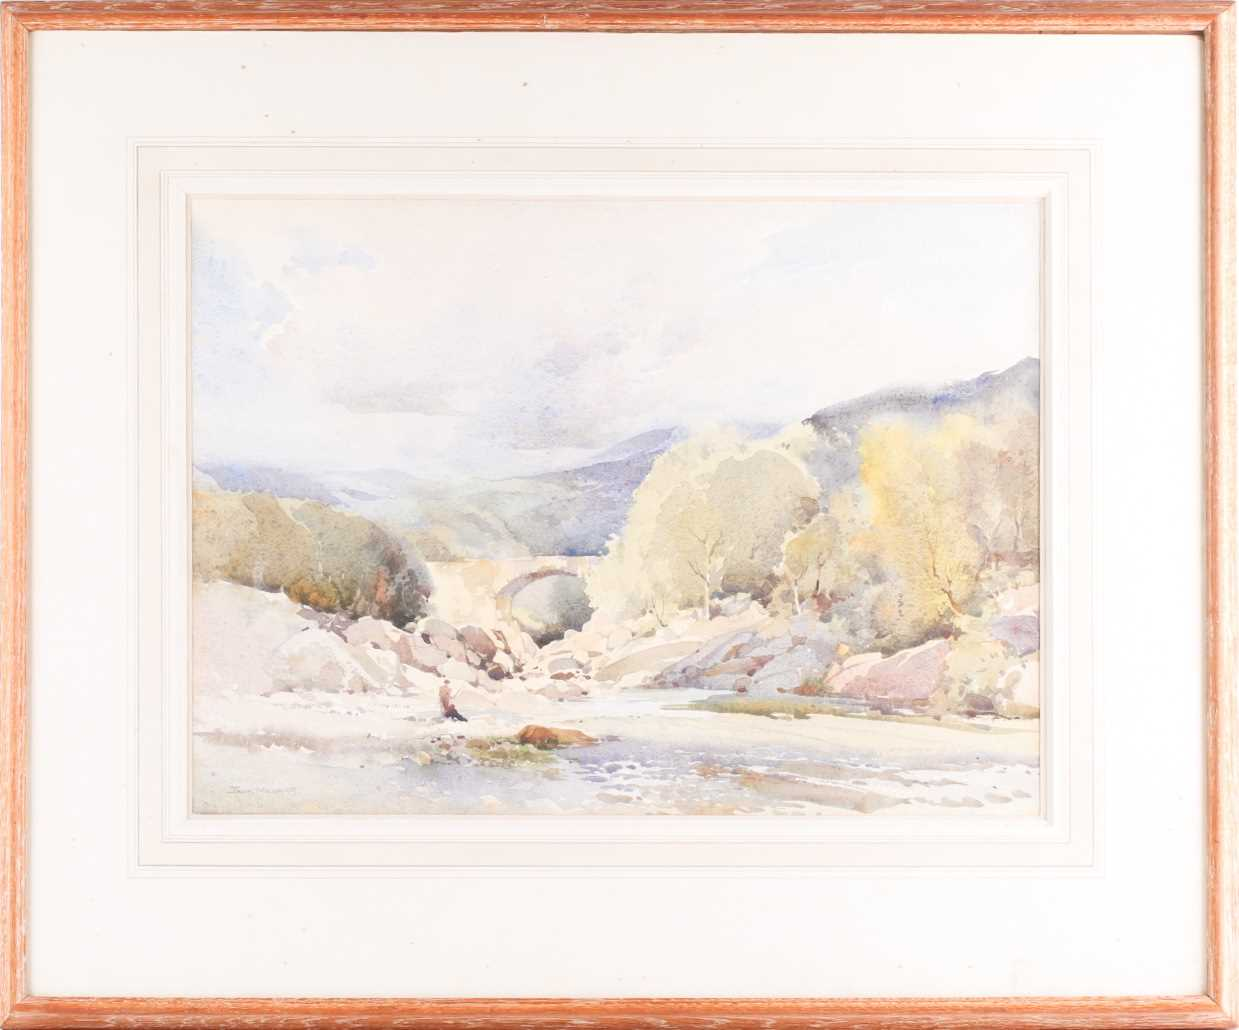 Jack Merriott RI, ROI, RSMA, RWS (1901-1968), 'Killicrankie', a fisherman on rocks beside a river,